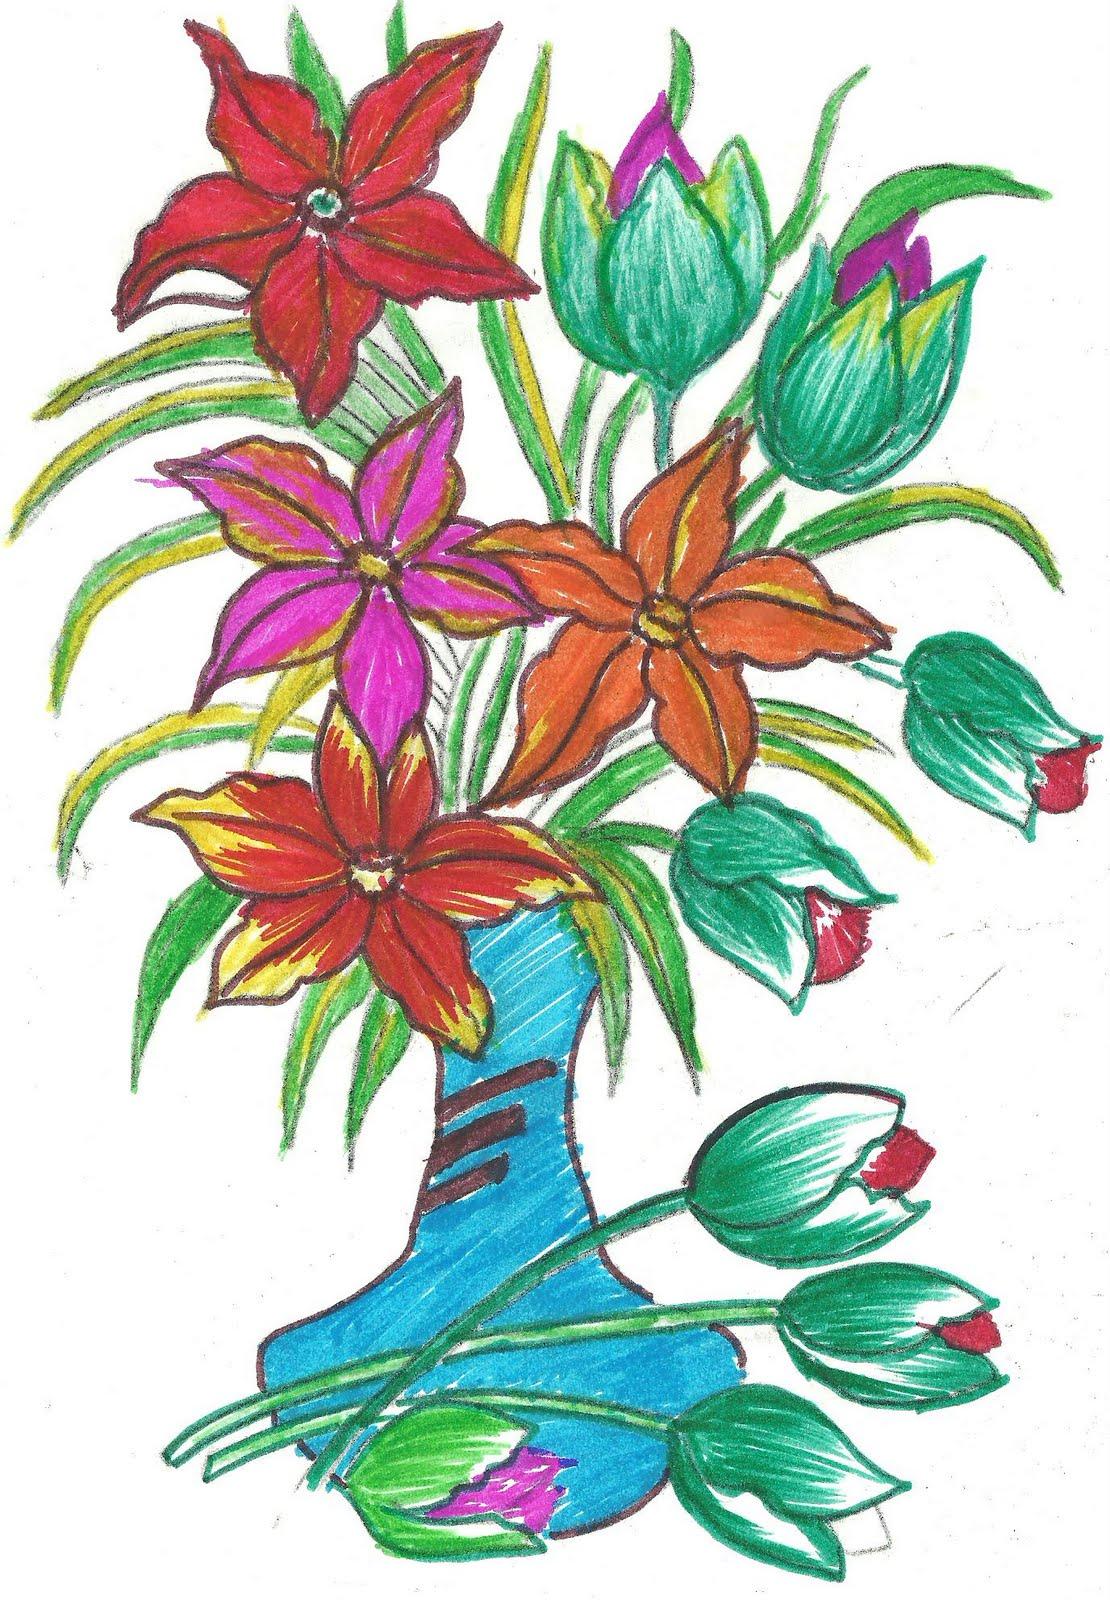 art n craft fabric paint designs